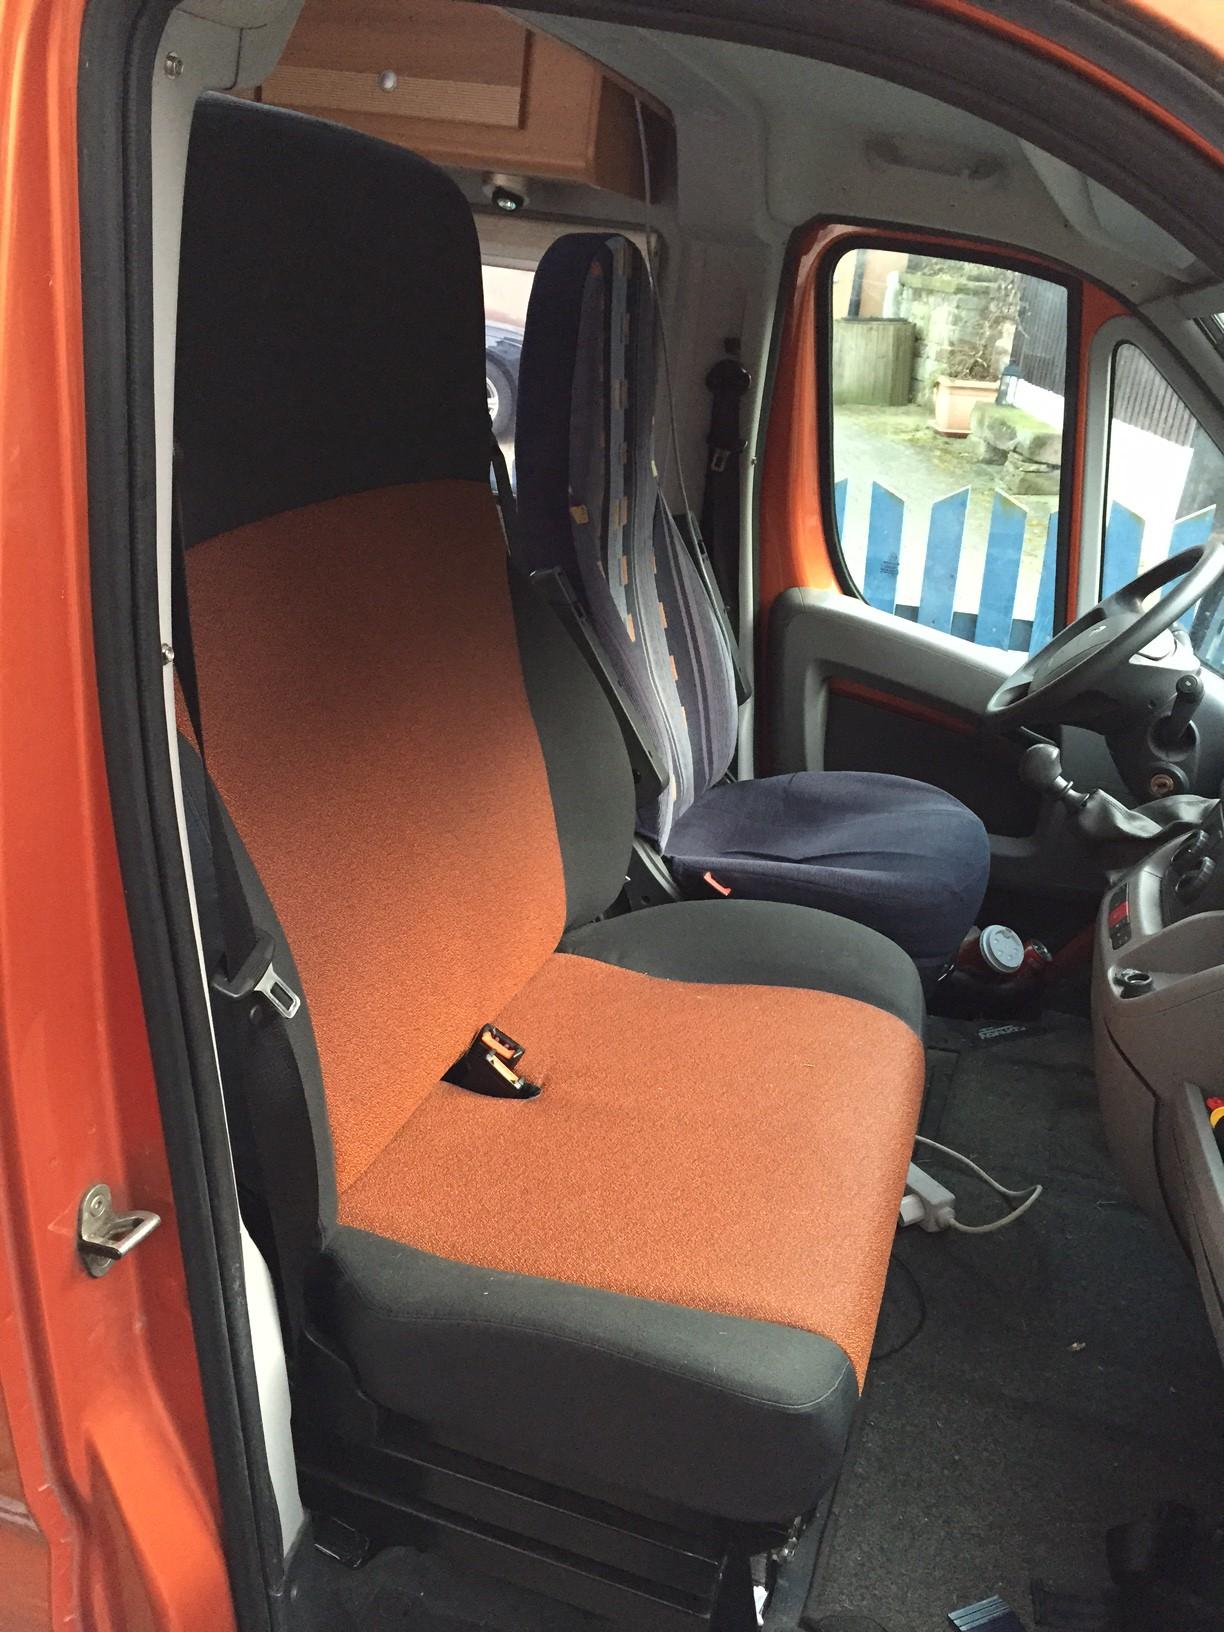 drehbare doppelsitzbank bietet auch platz f r insgesamt. Black Bedroom Furniture Sets. Home Design Ideas